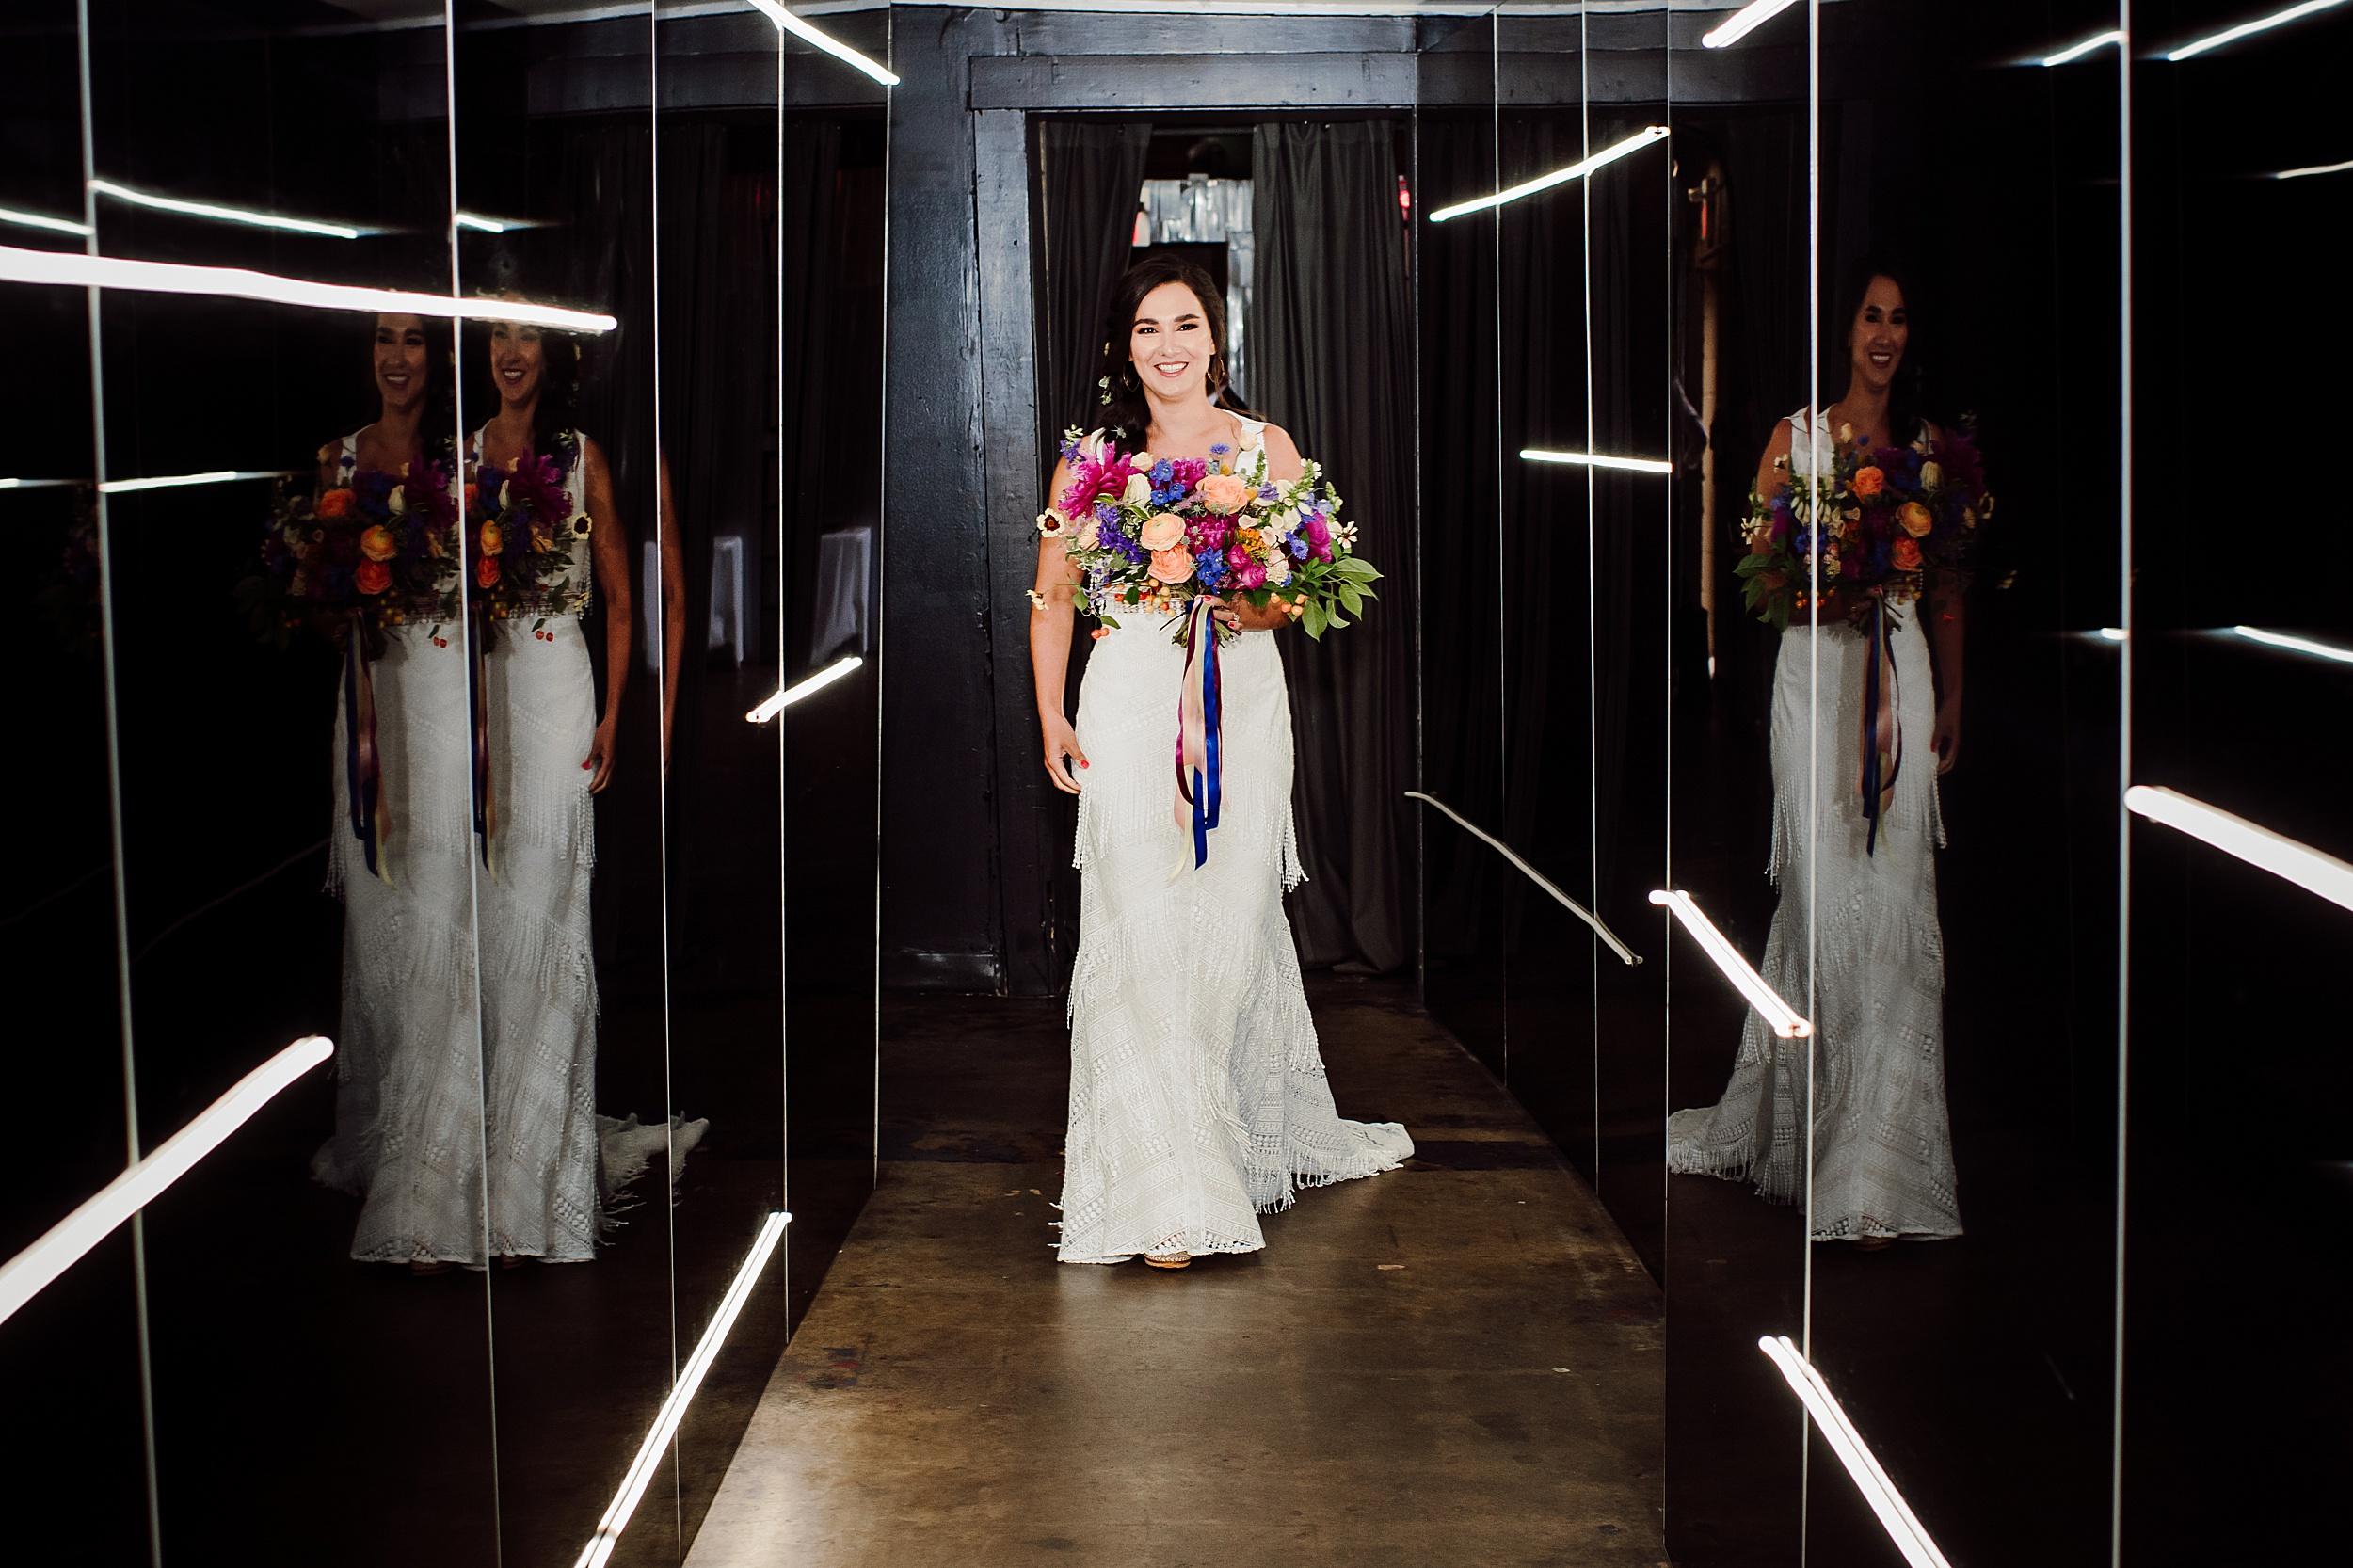 Airship-37-Berkeley-Events-Distillery-District-Wedding-Toronto-Wedding-Photographers_0029.jpg